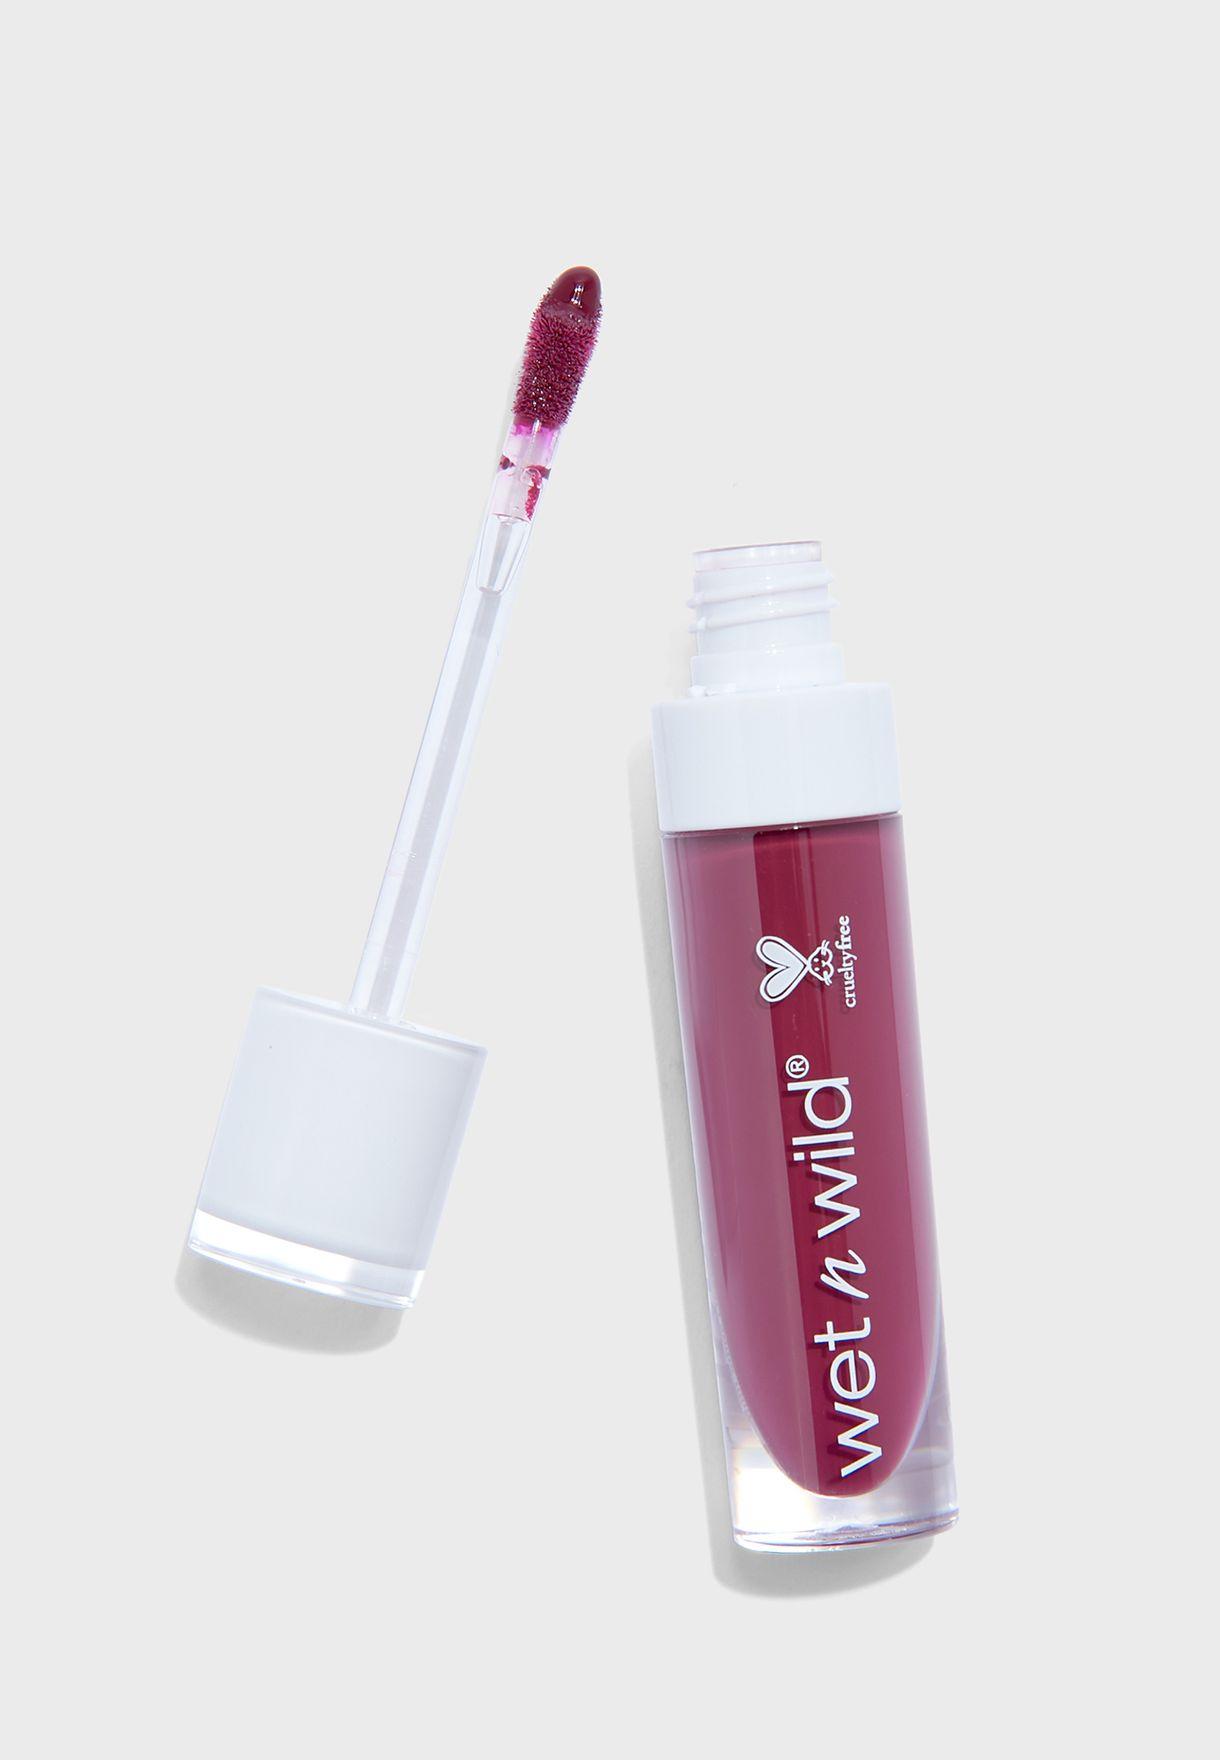 Megalast Hi-Shine Liquid Lipstick WineIsTheAnswer